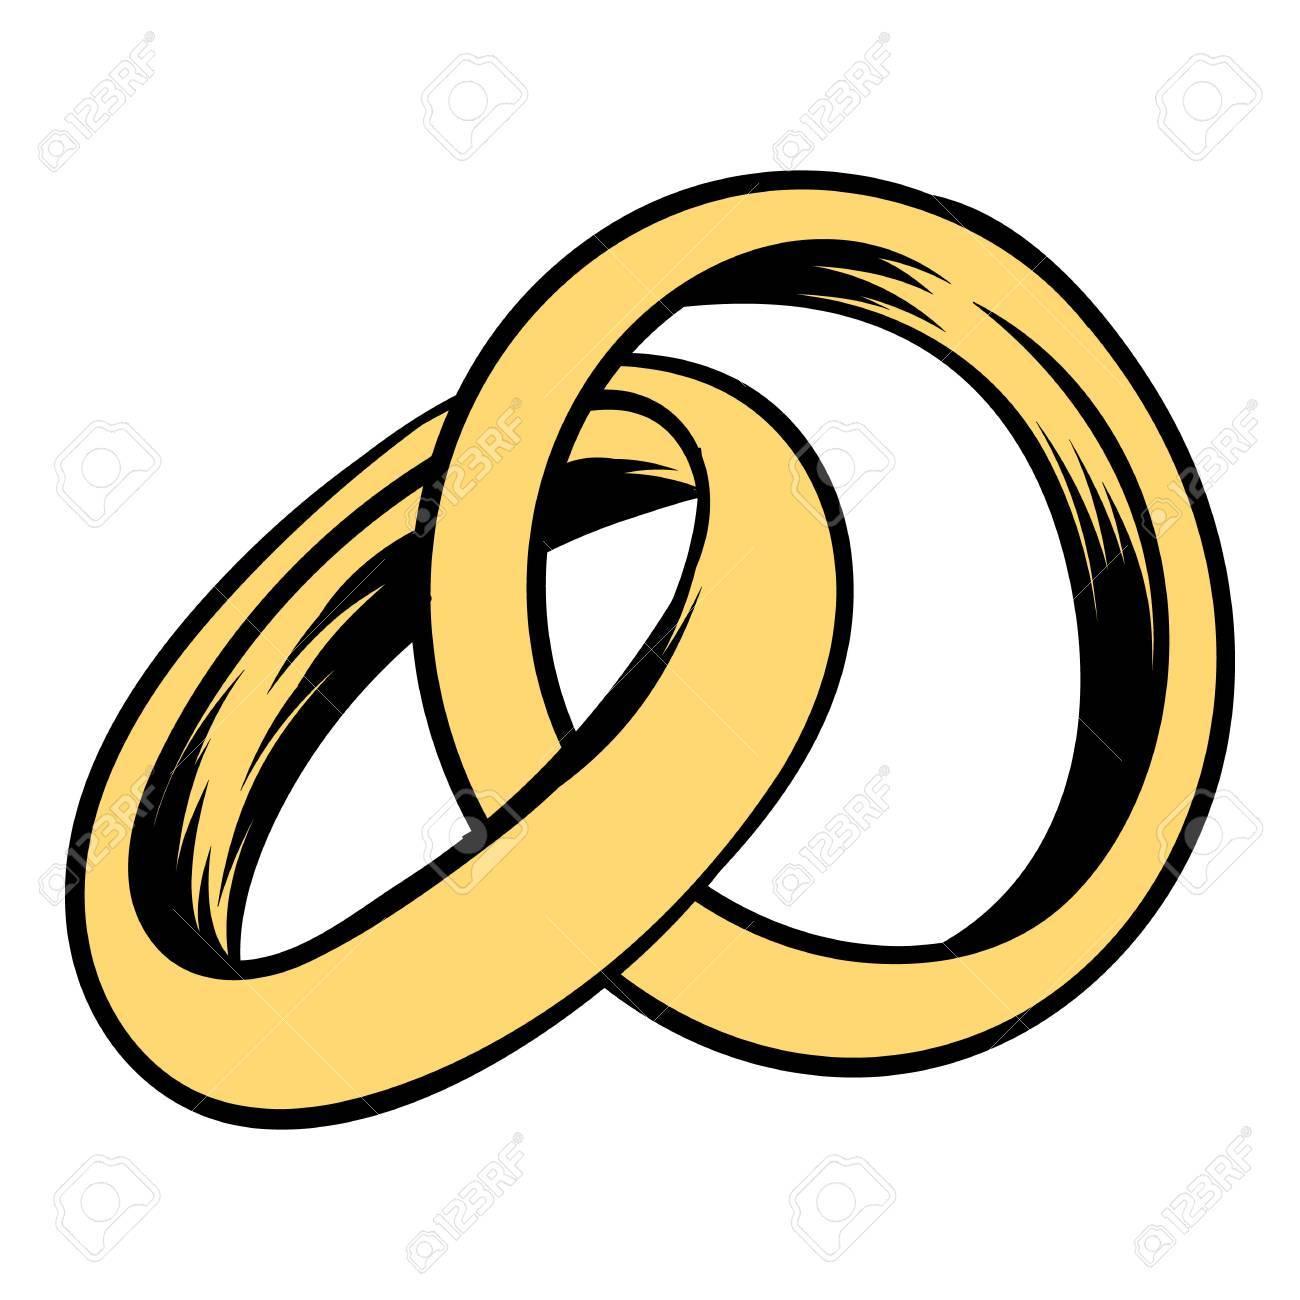 Wedding rings icon cartoon - 73501754